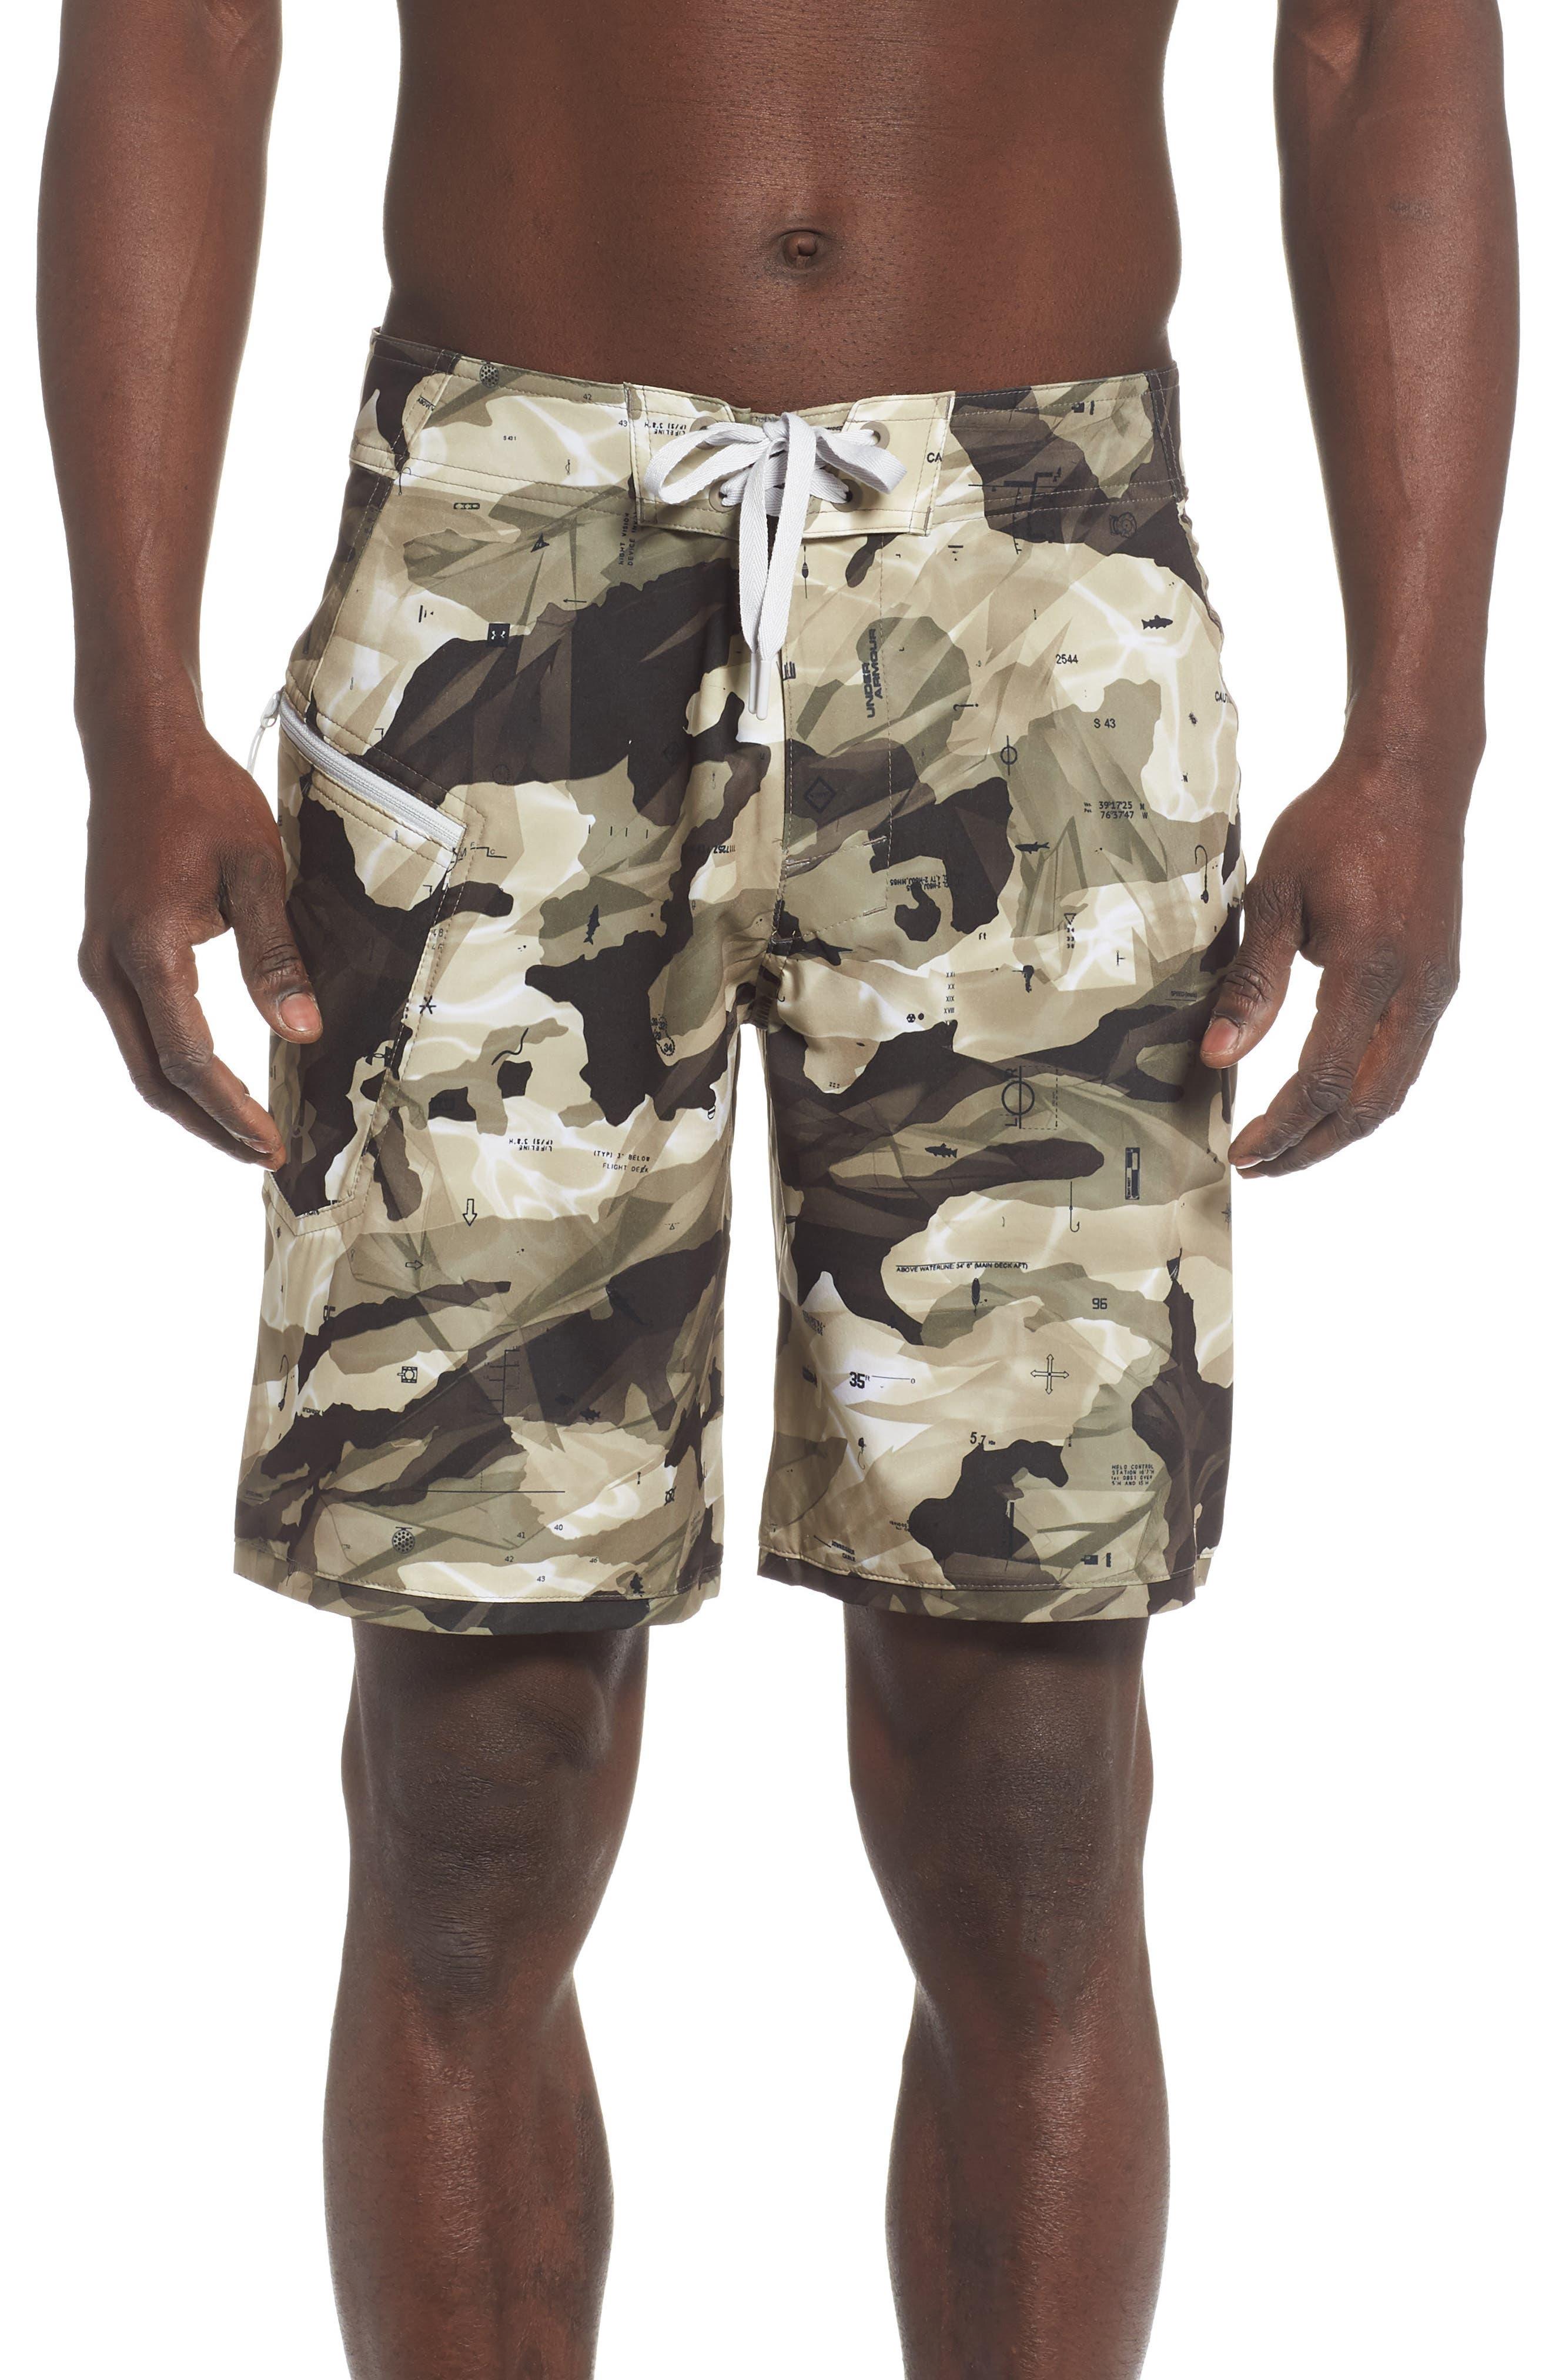 9f7cda9bfe Sale: Men's Swimwear Clothing | Nordstrom